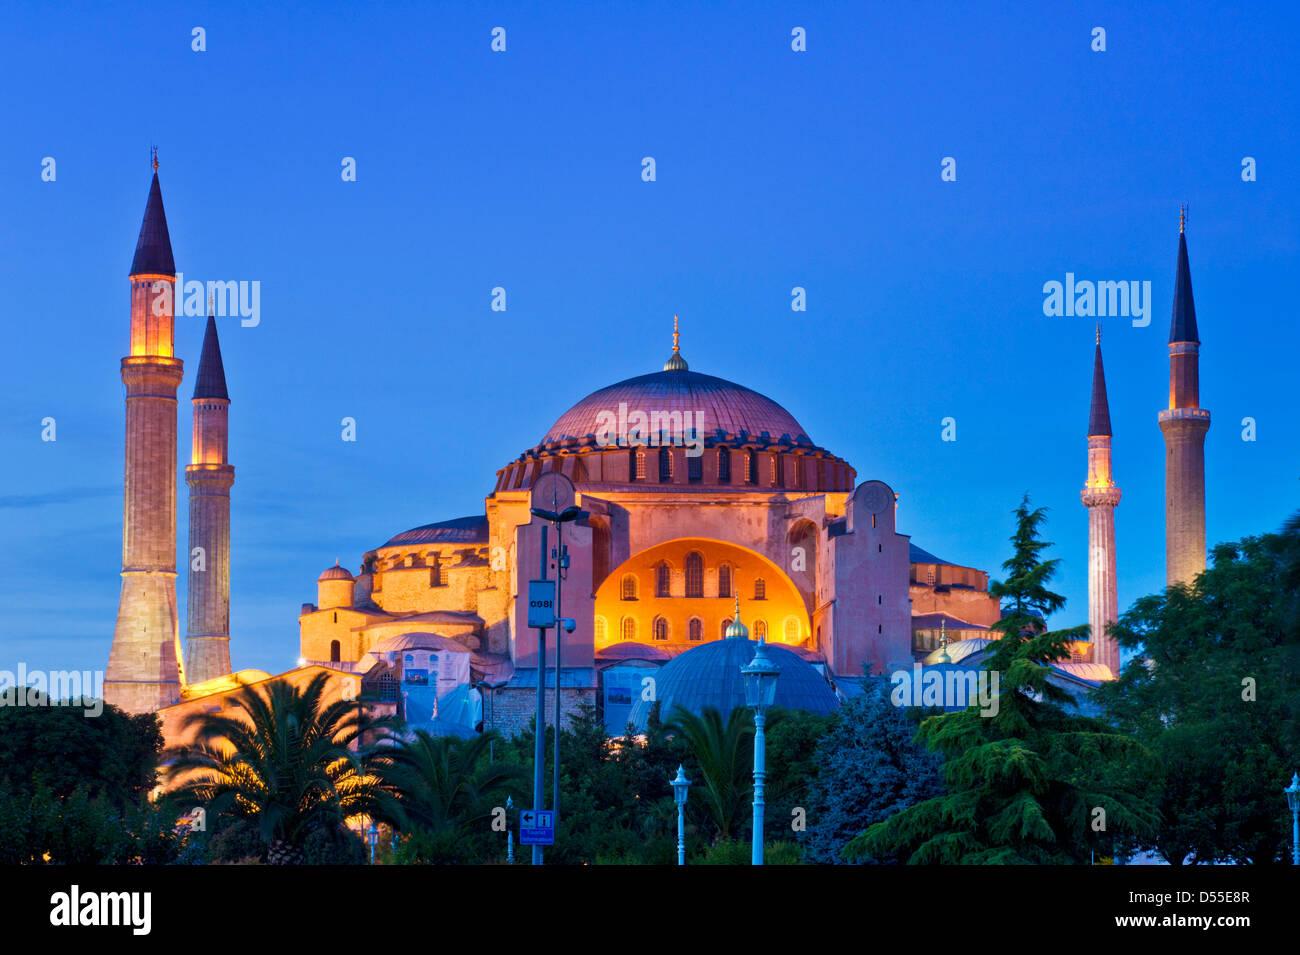 Hagia Sophia or Church of Holy Wisdom floodlit at night, Sultanahmet, Istanbul, Turkey - Stock Image